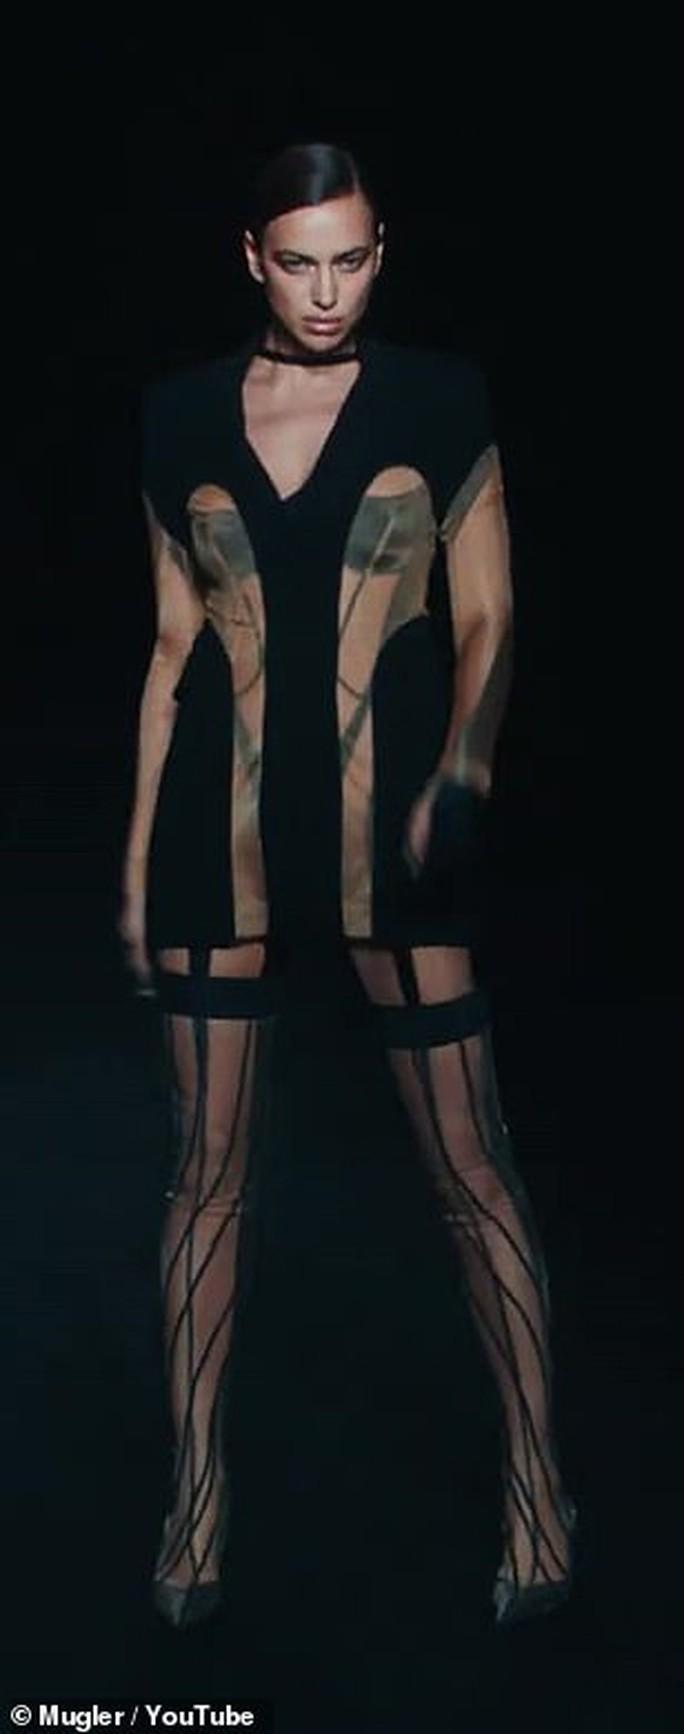 Siêu mẫu Bella Hadid, Irina Shayk khoe vẻ gợi cảm  - Ảnh 6.